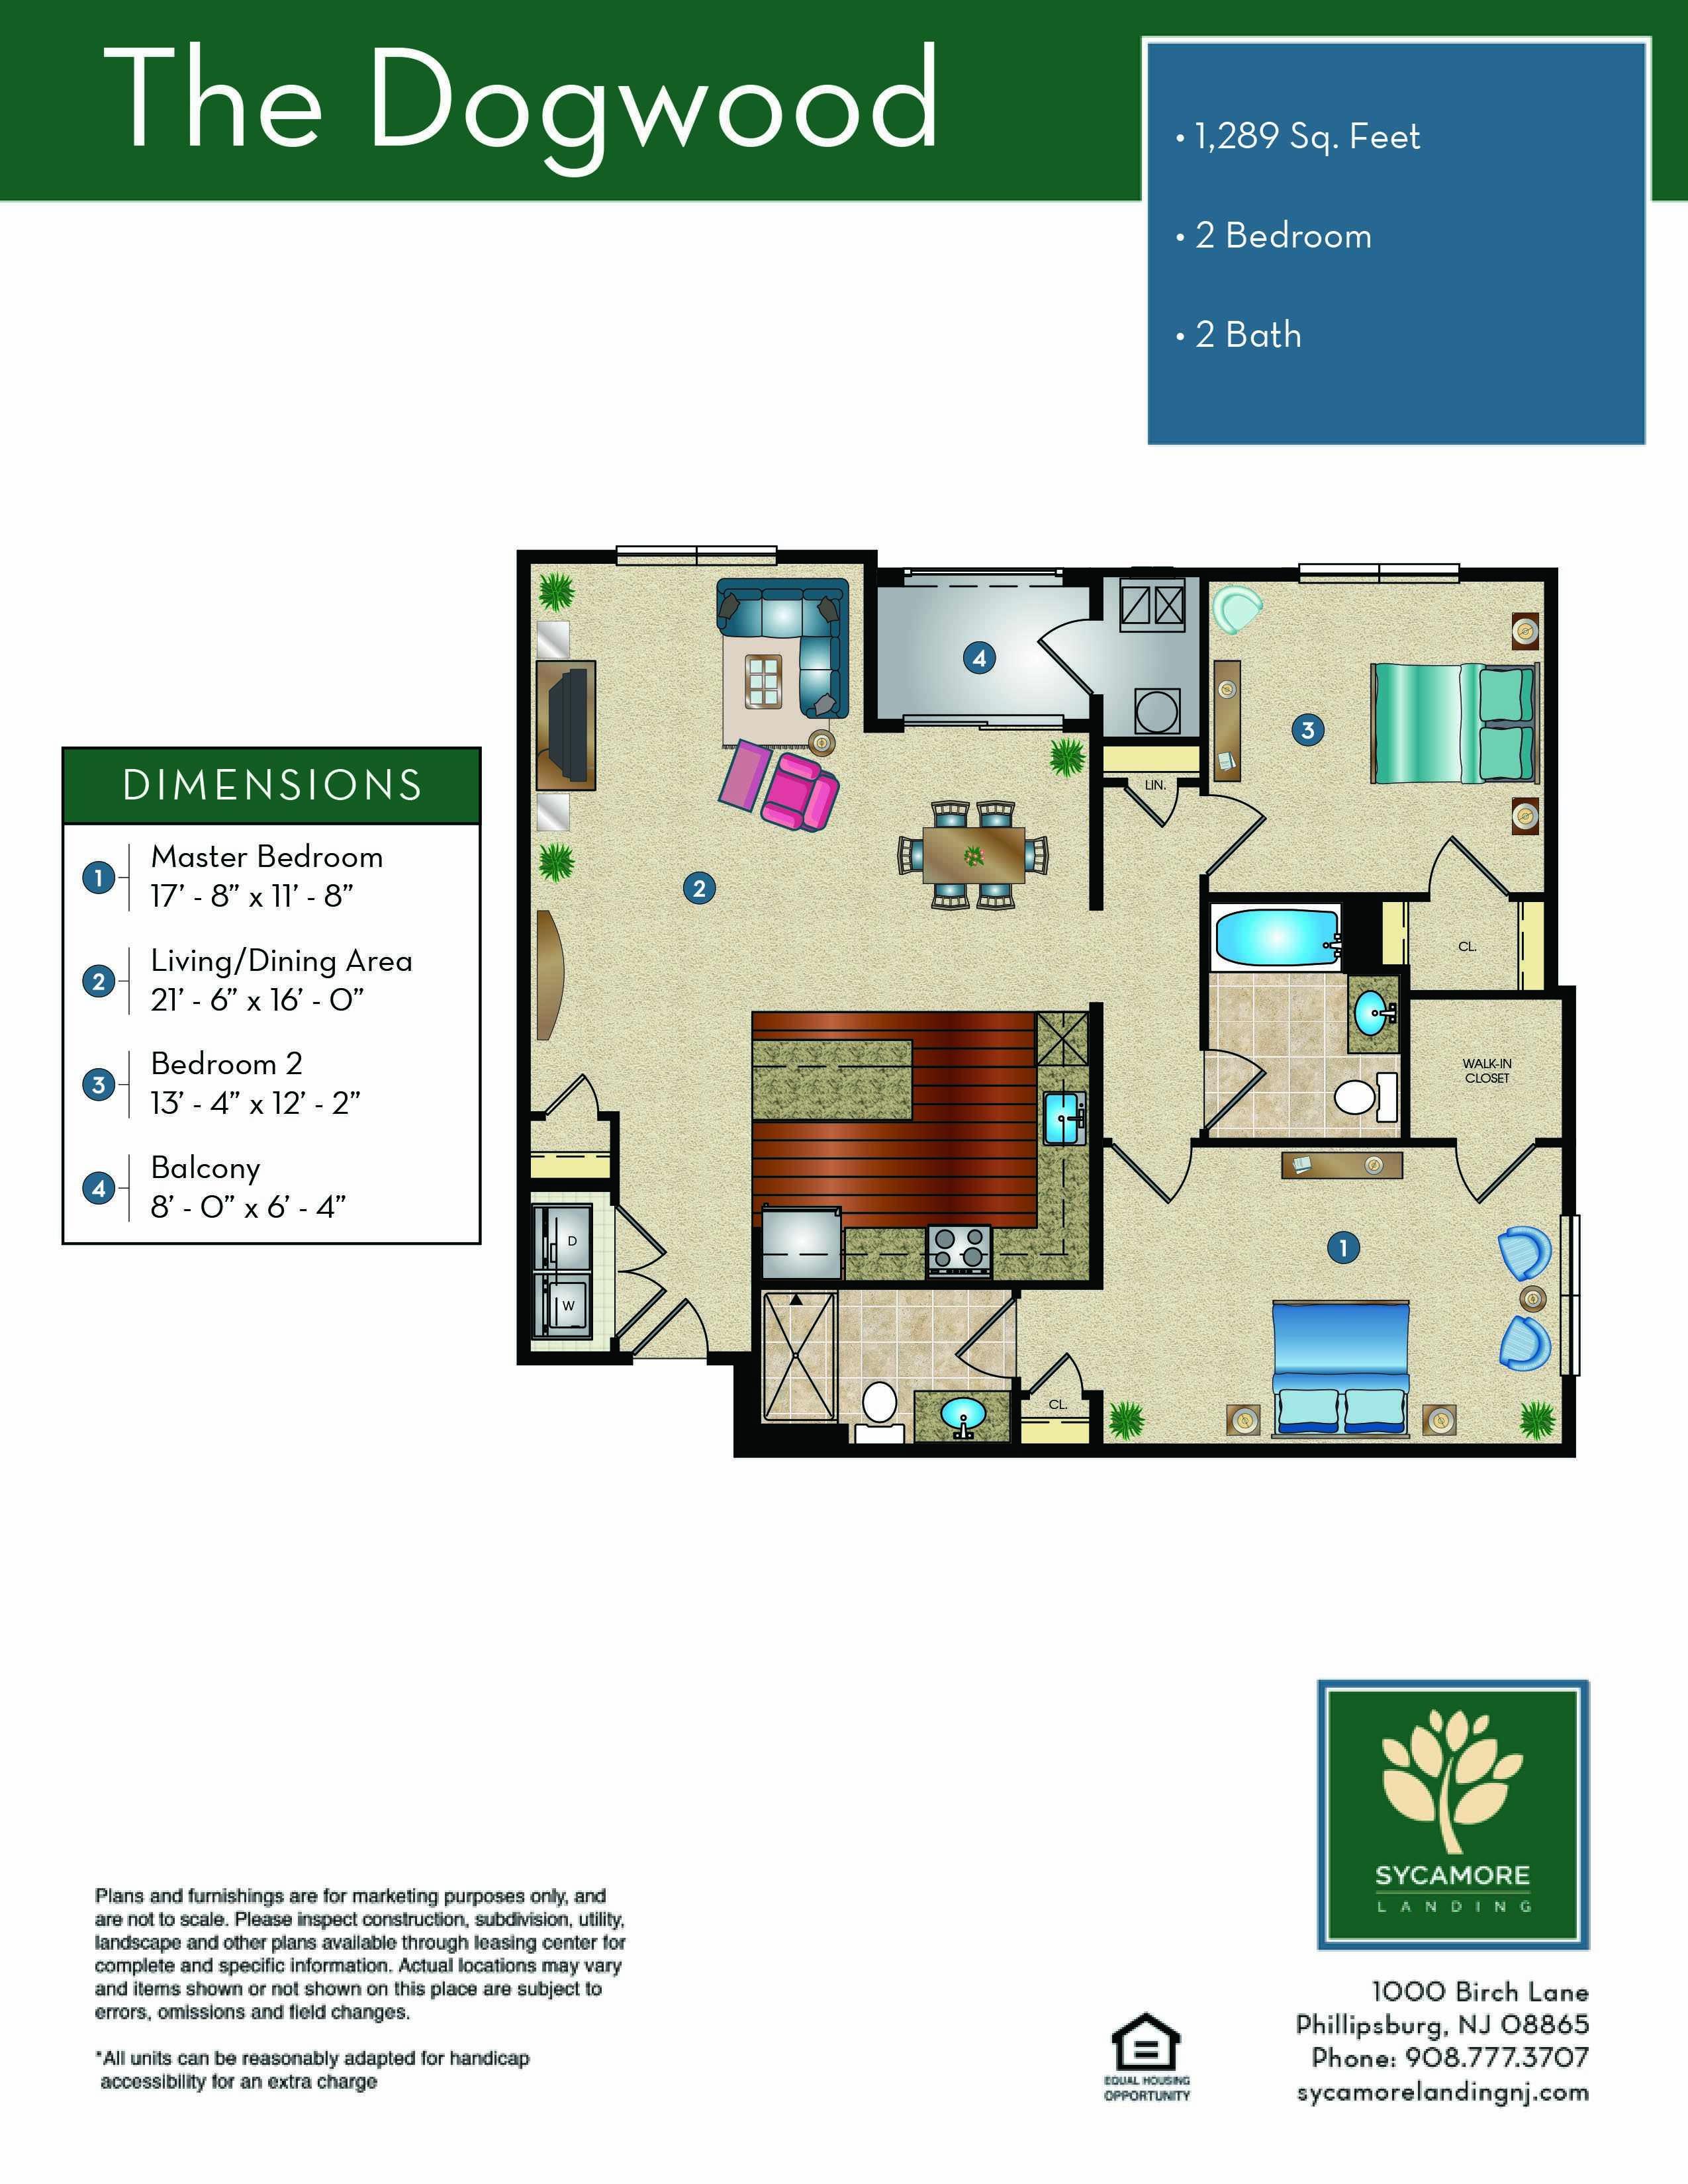 The Dogwood Floor Plan